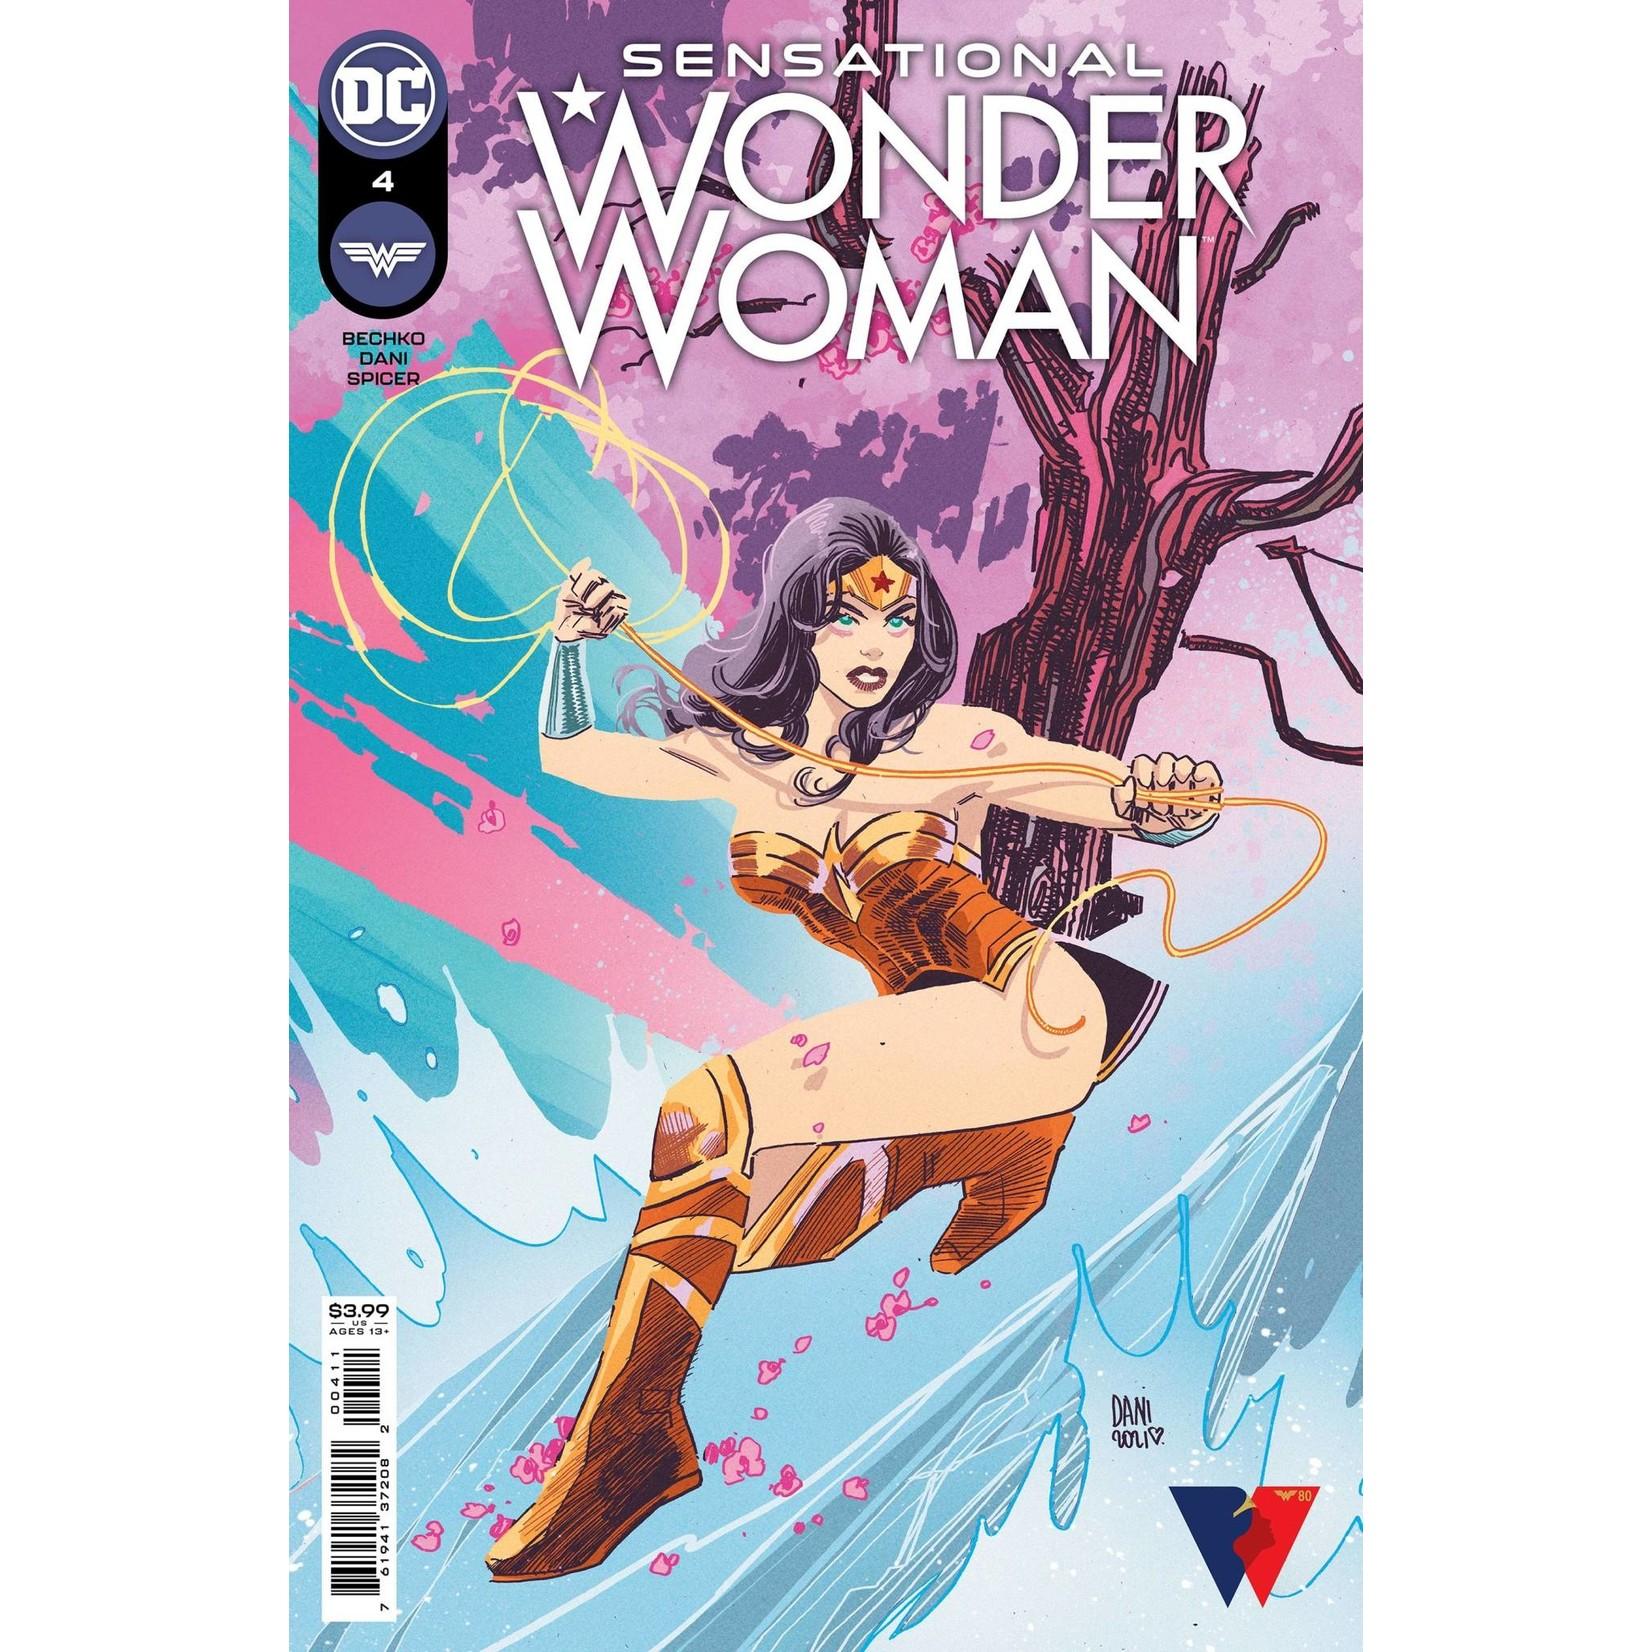 DC Comics SENSATIONAL WONDER WOMAN #4 CVR A DANI